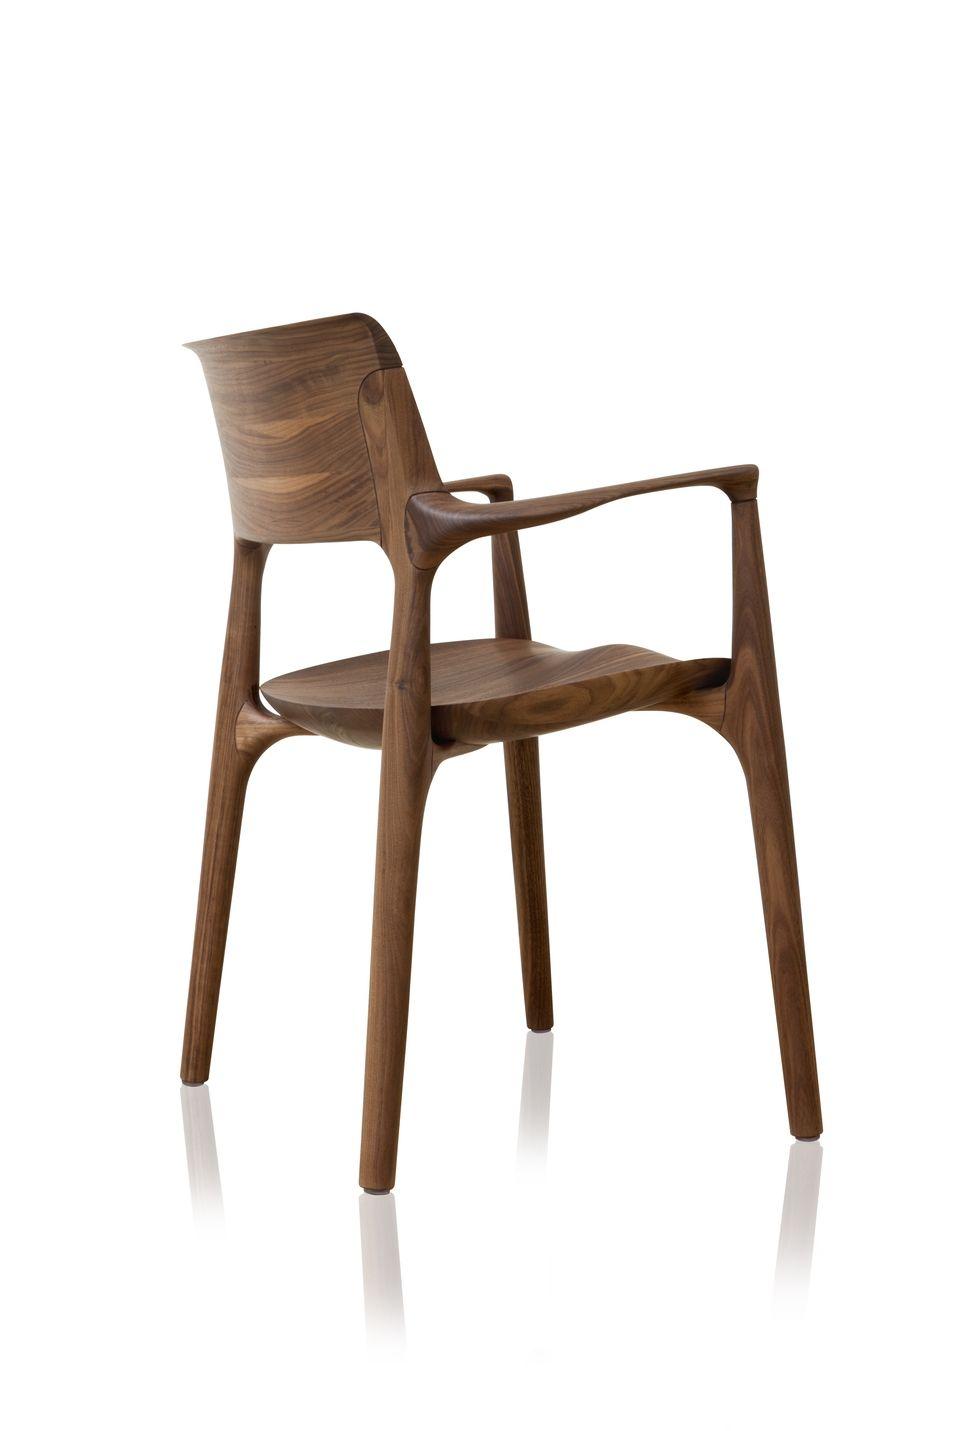 http://www.design42day.com/events/brera-design-district/89#sollos-present-jader ...